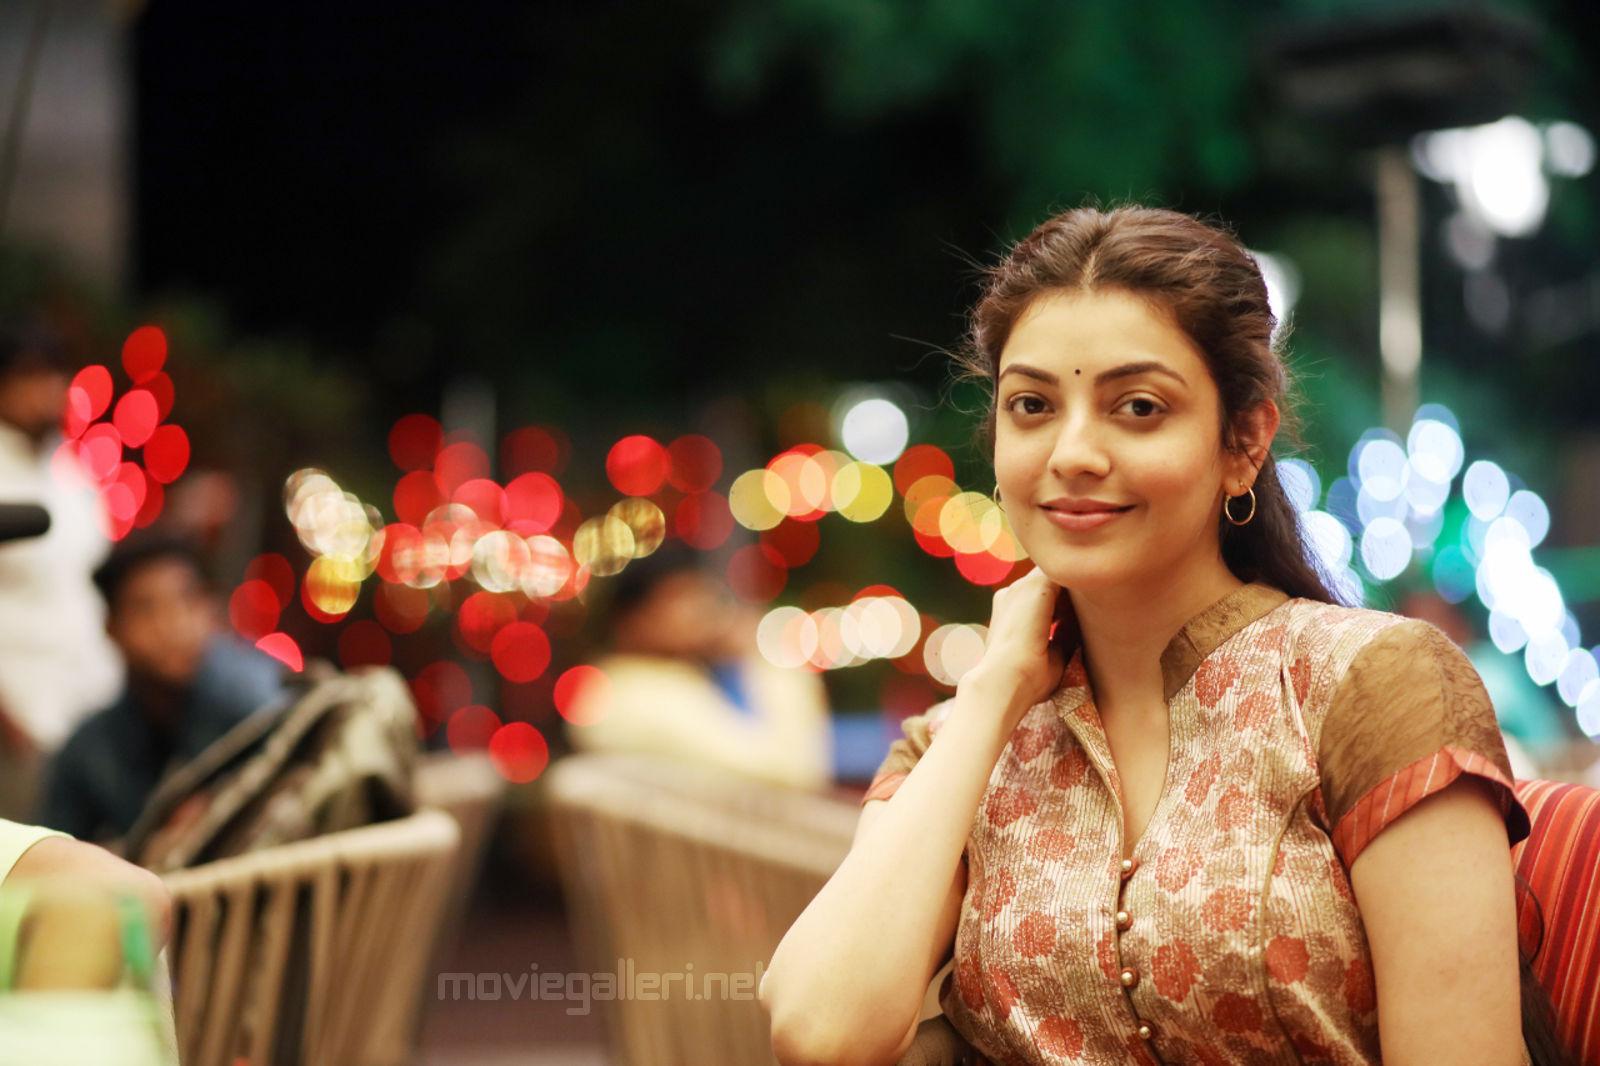 Actress Kajal Agarwal Paris Paris Movie to be referred to Revising Committee